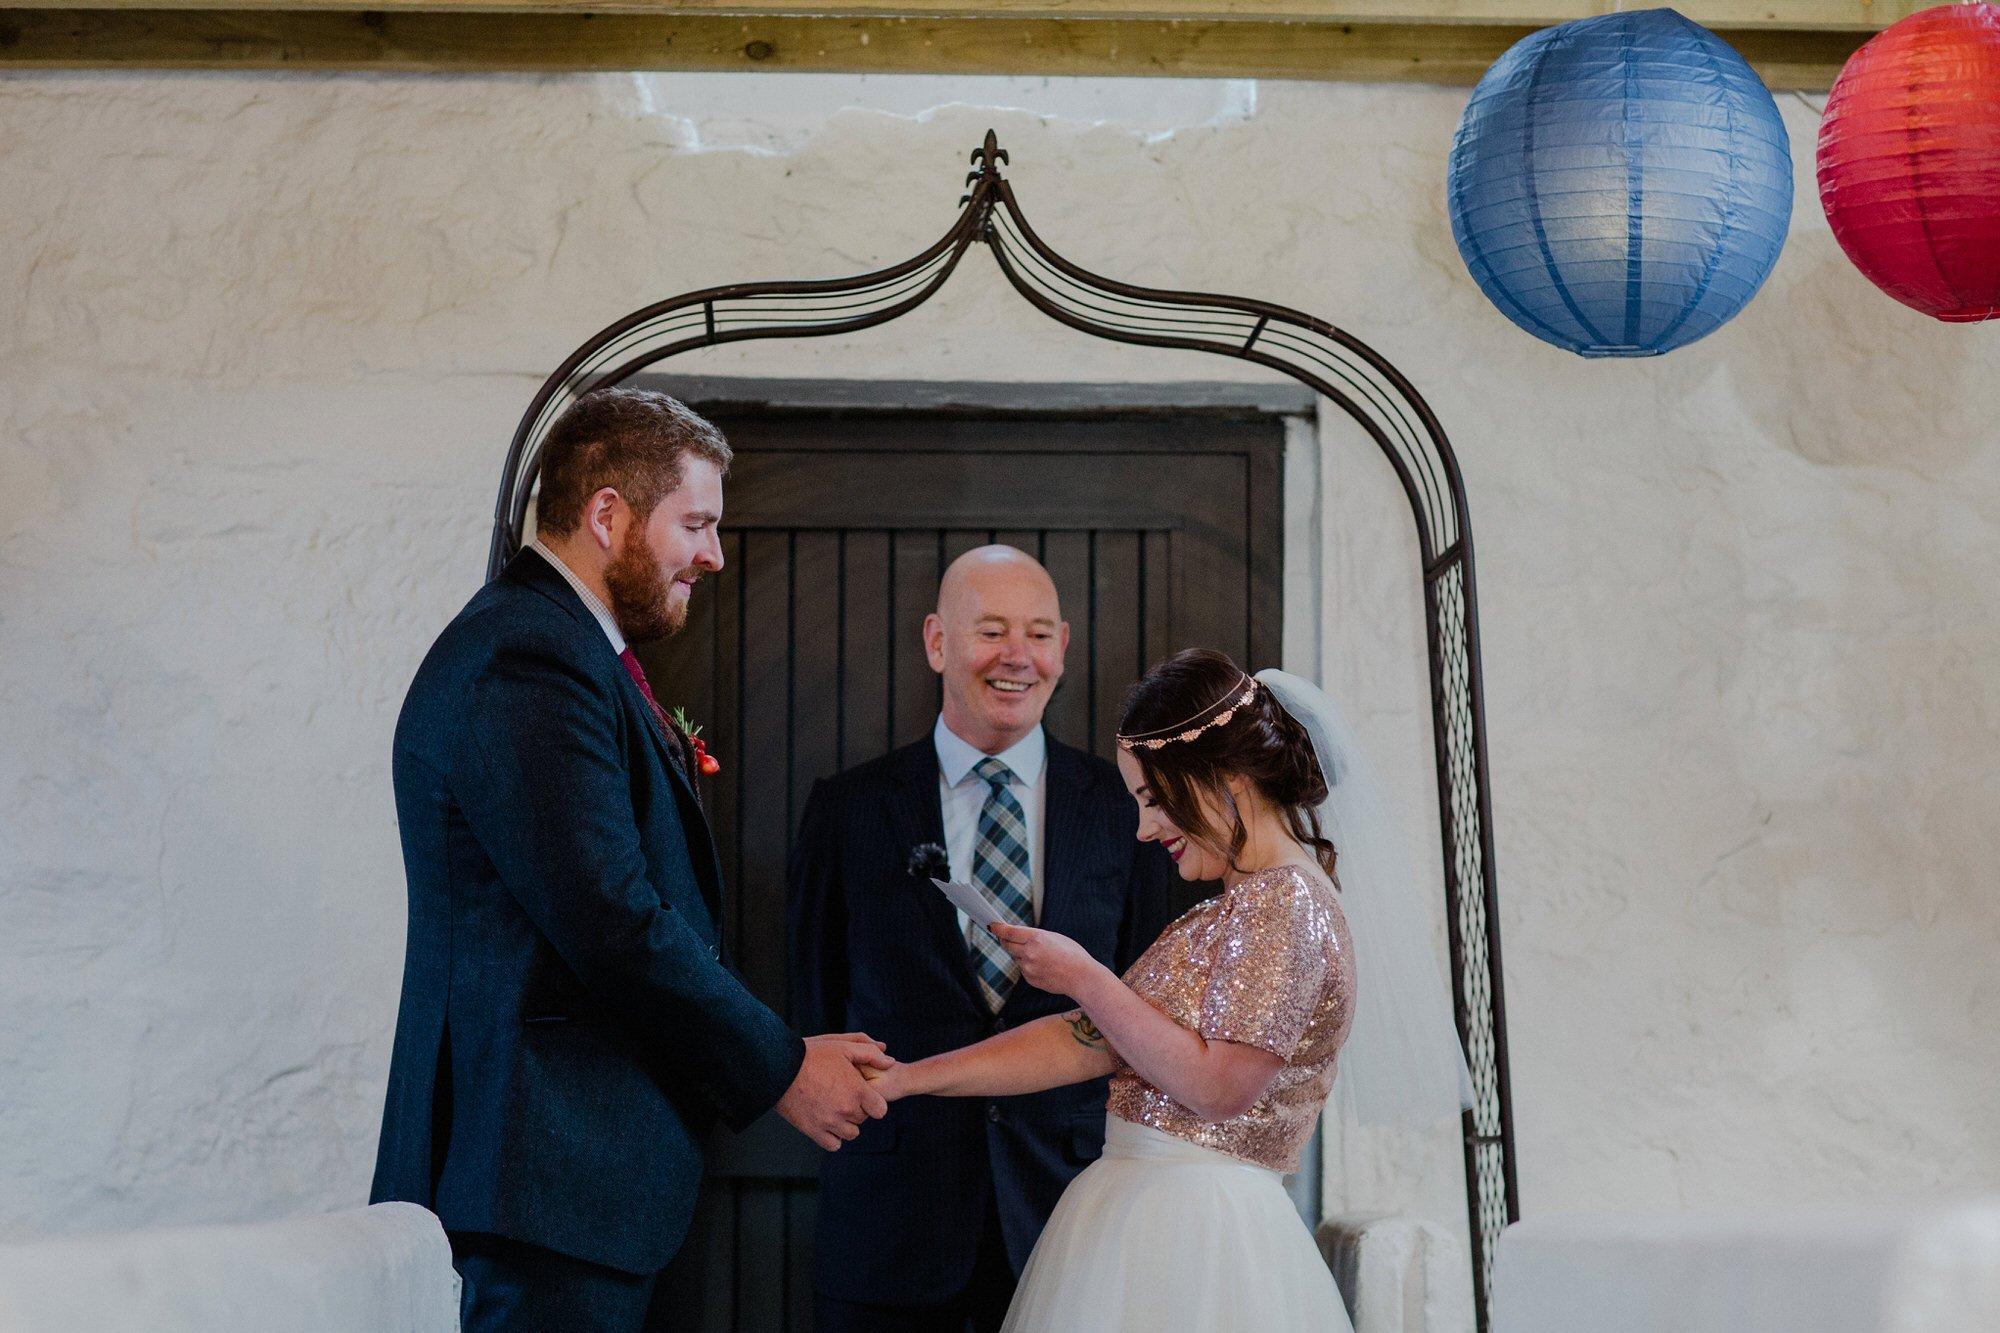 025 TIN SHED KNOCKRAICH FARM WEDDING ALTERNATIVE BRIDE ZOE ALEXANDRA PHOTOGRAPHY